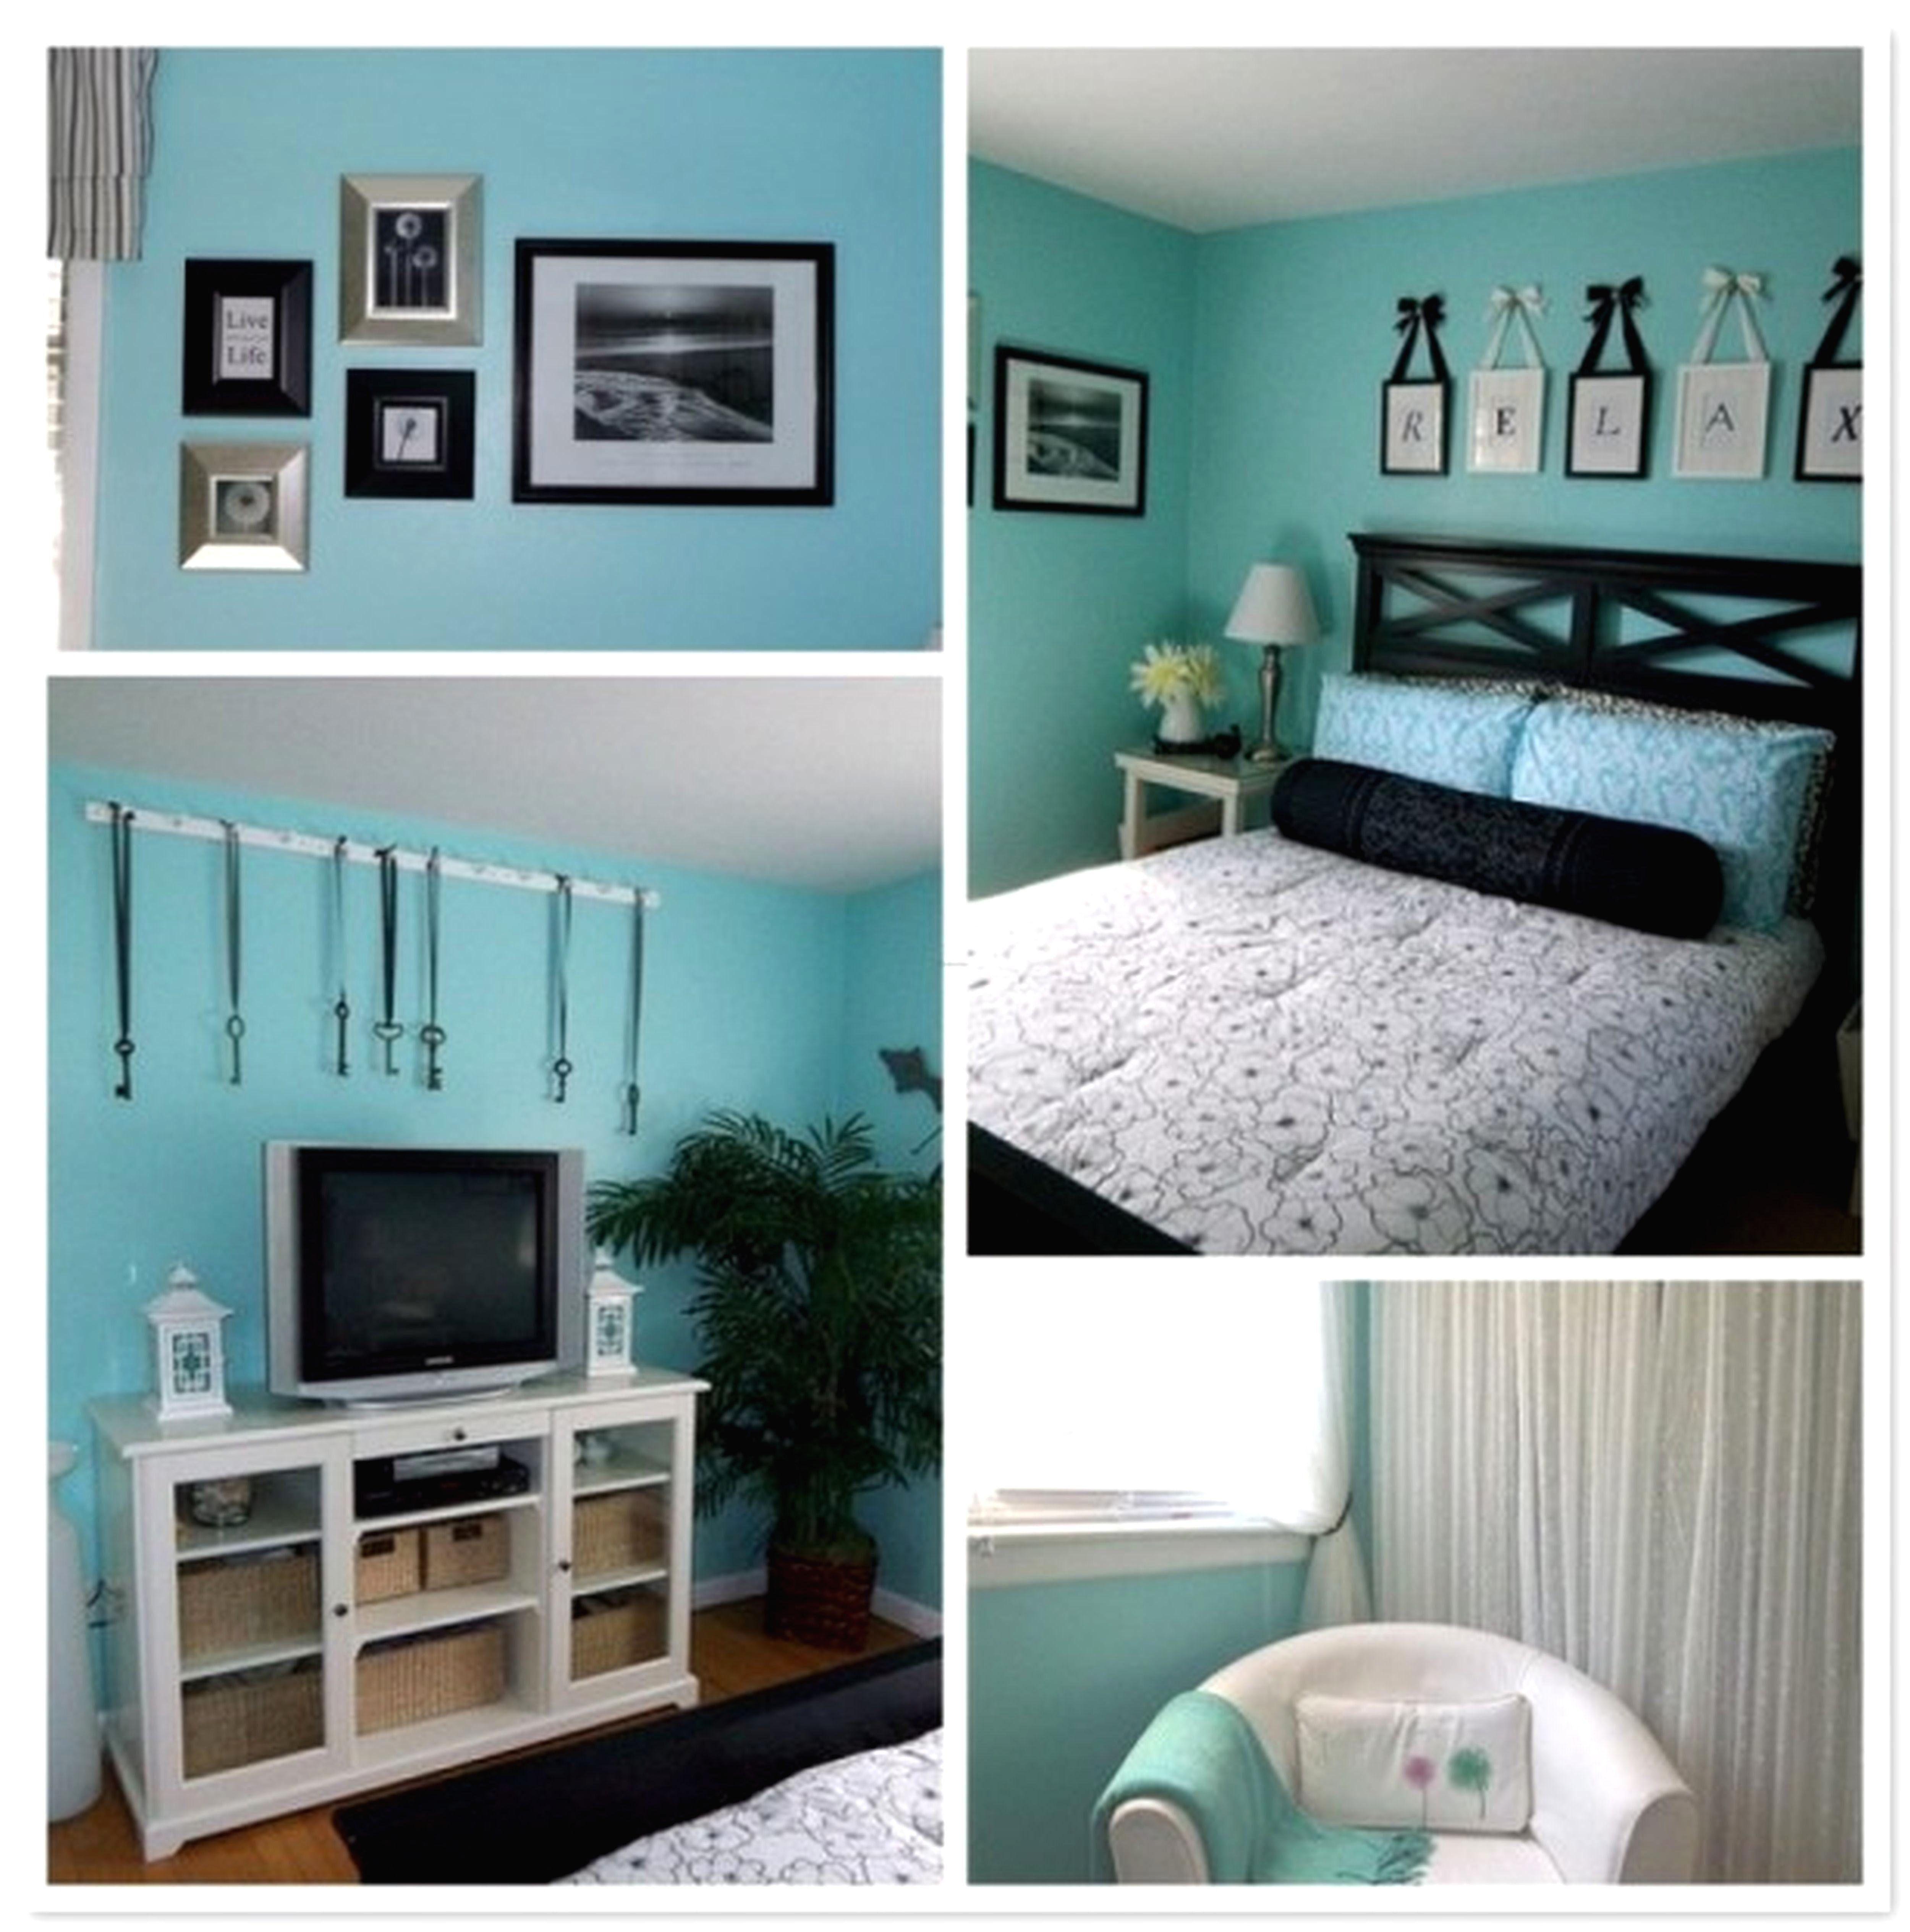 Bedroom Compact Ideas For Teenage Girls Blue Tumblr Plywood Teen Girl Design  Inspiration Interior Room